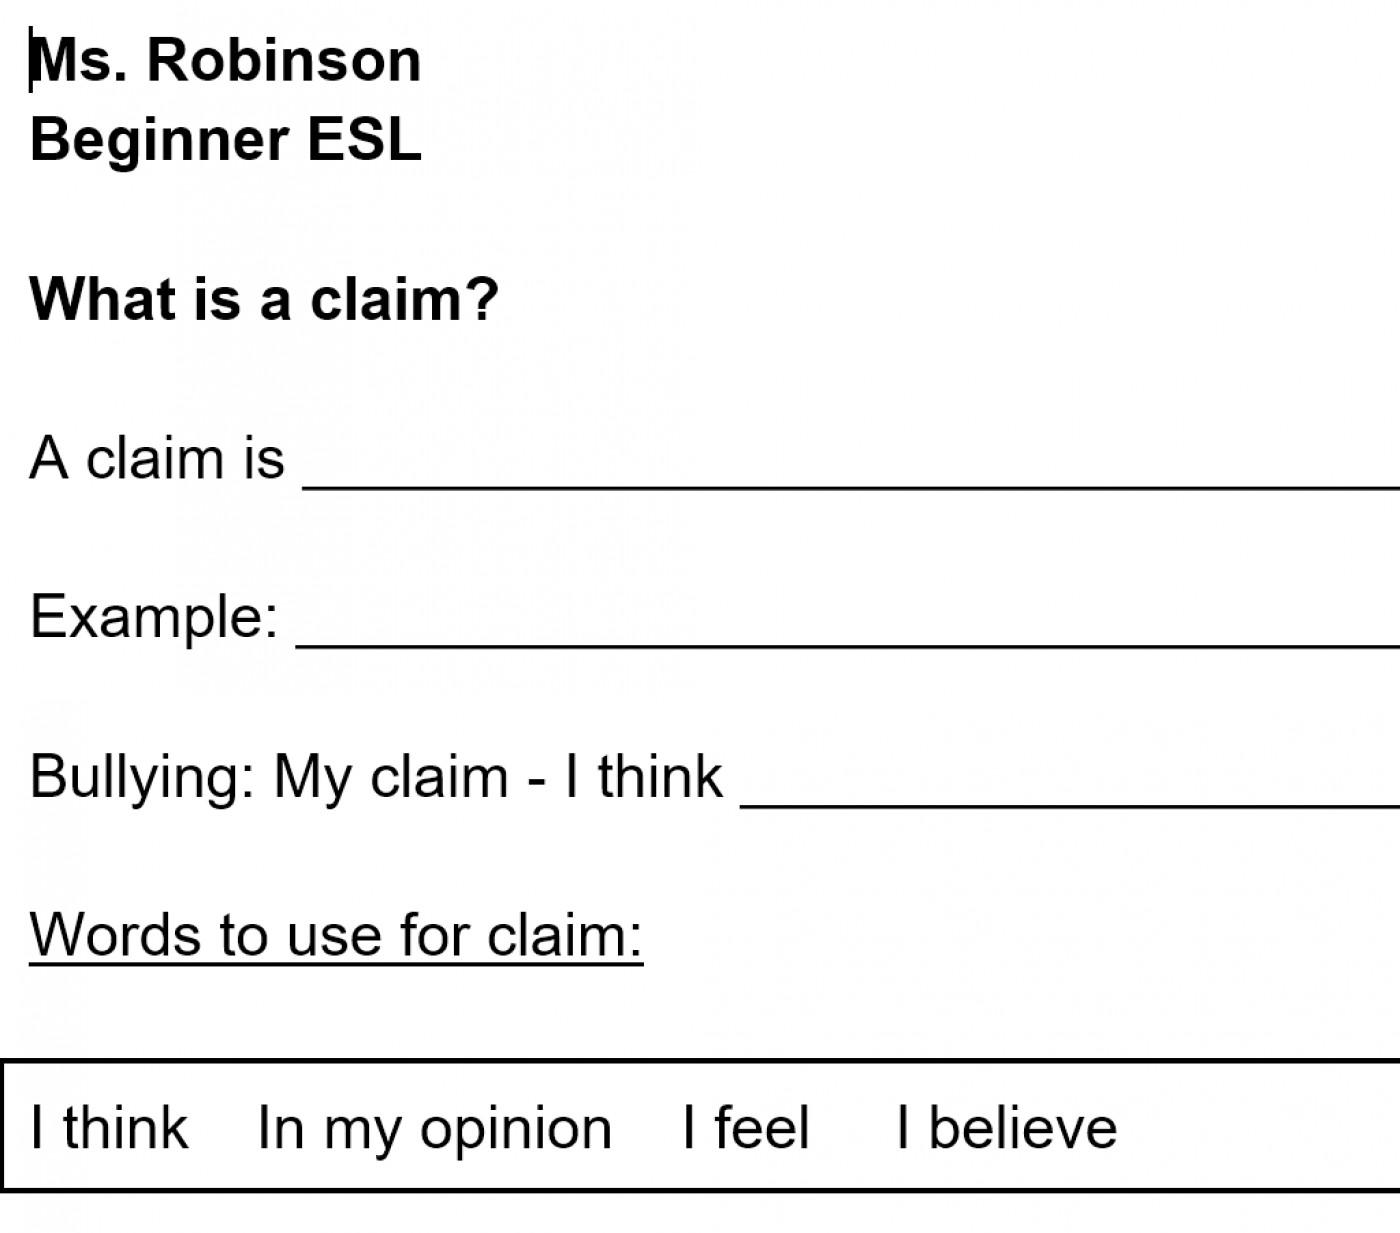 012 Essay Example Refutation Reflective Sample Paper